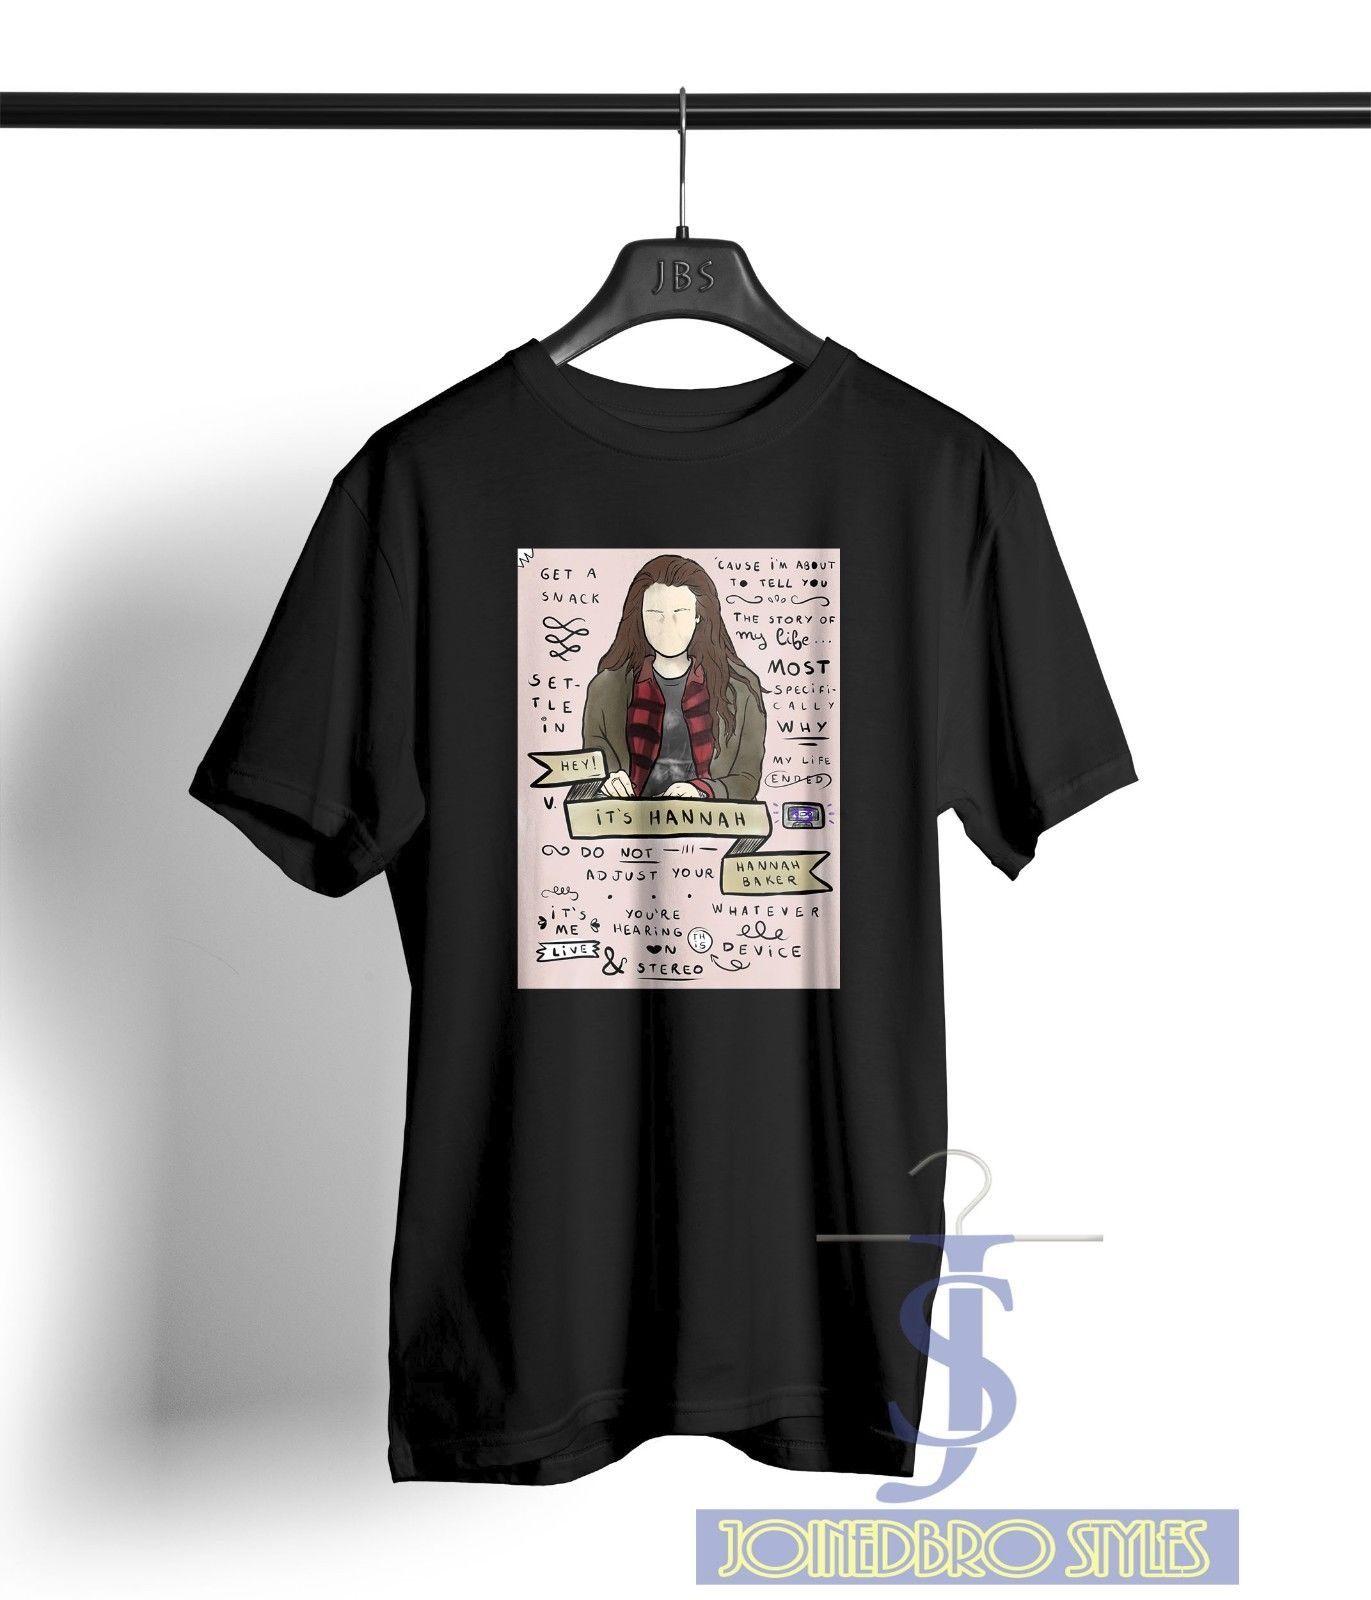 d05b3c1e9df6 Hey It's Hannah Baker 13 reasons why alstyle apparel Black t shirt S-XL  Clay NEW